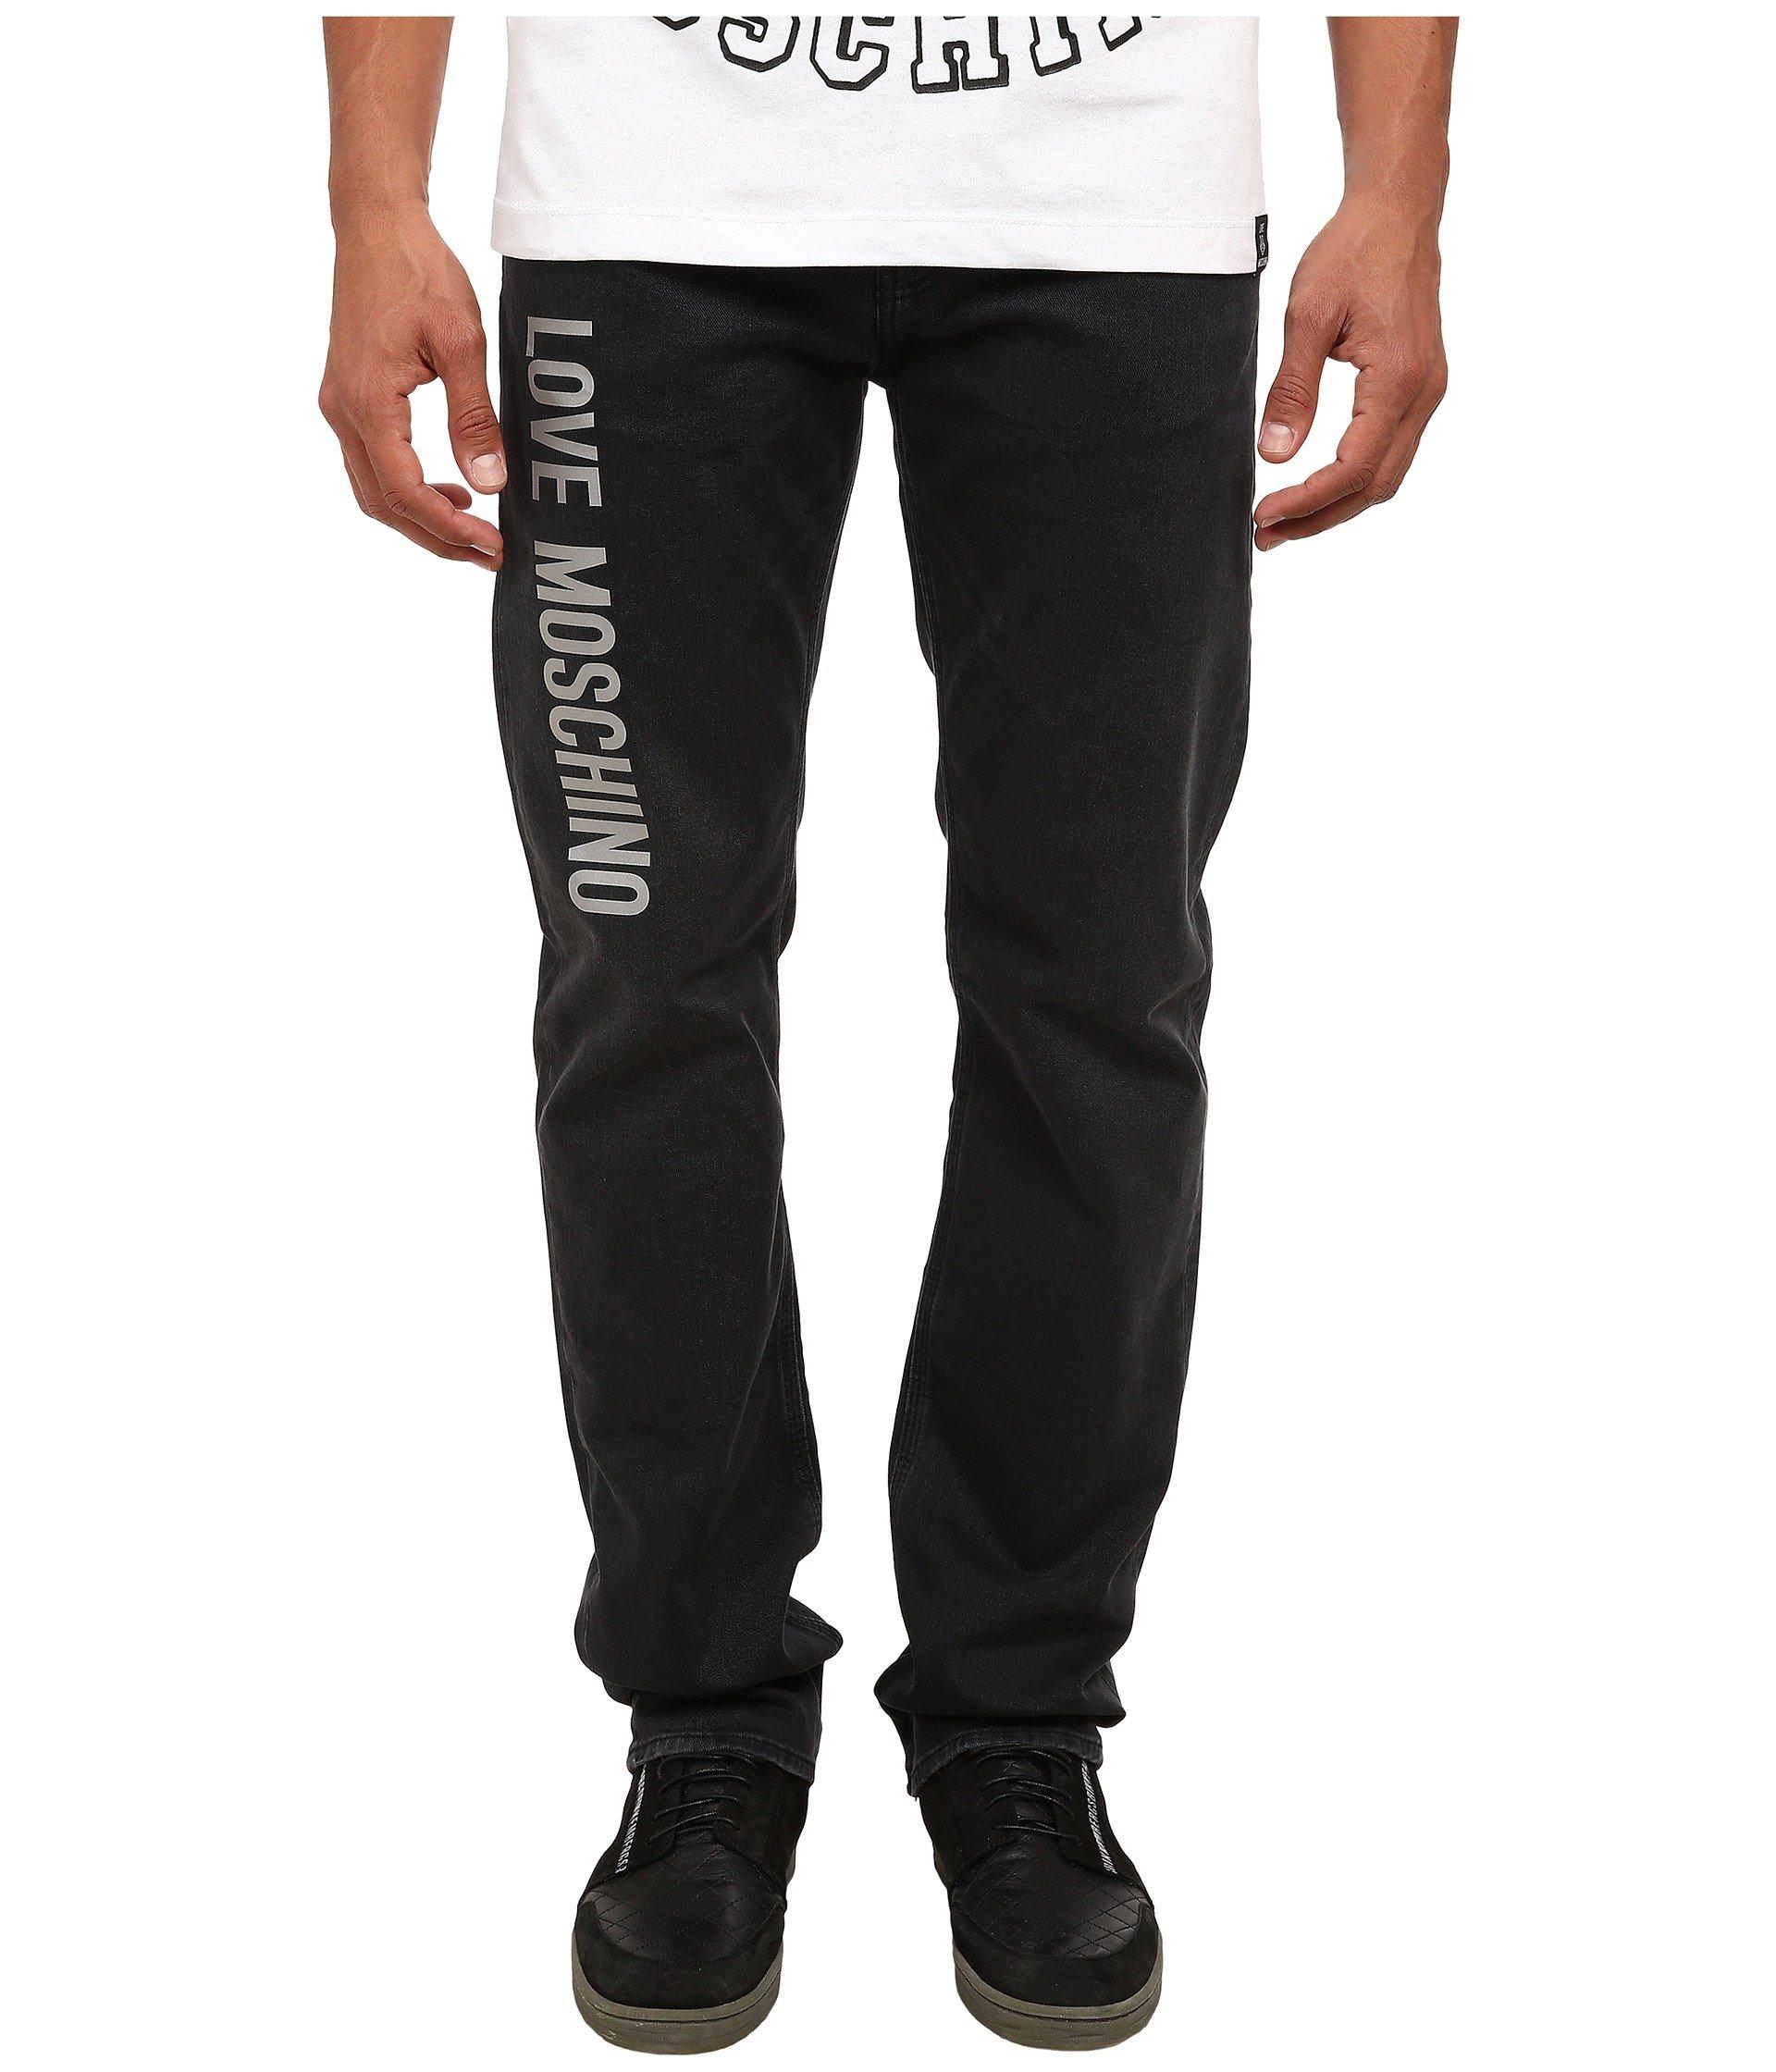 MOSCHINO Love Side Logo Jeans, Black (36)